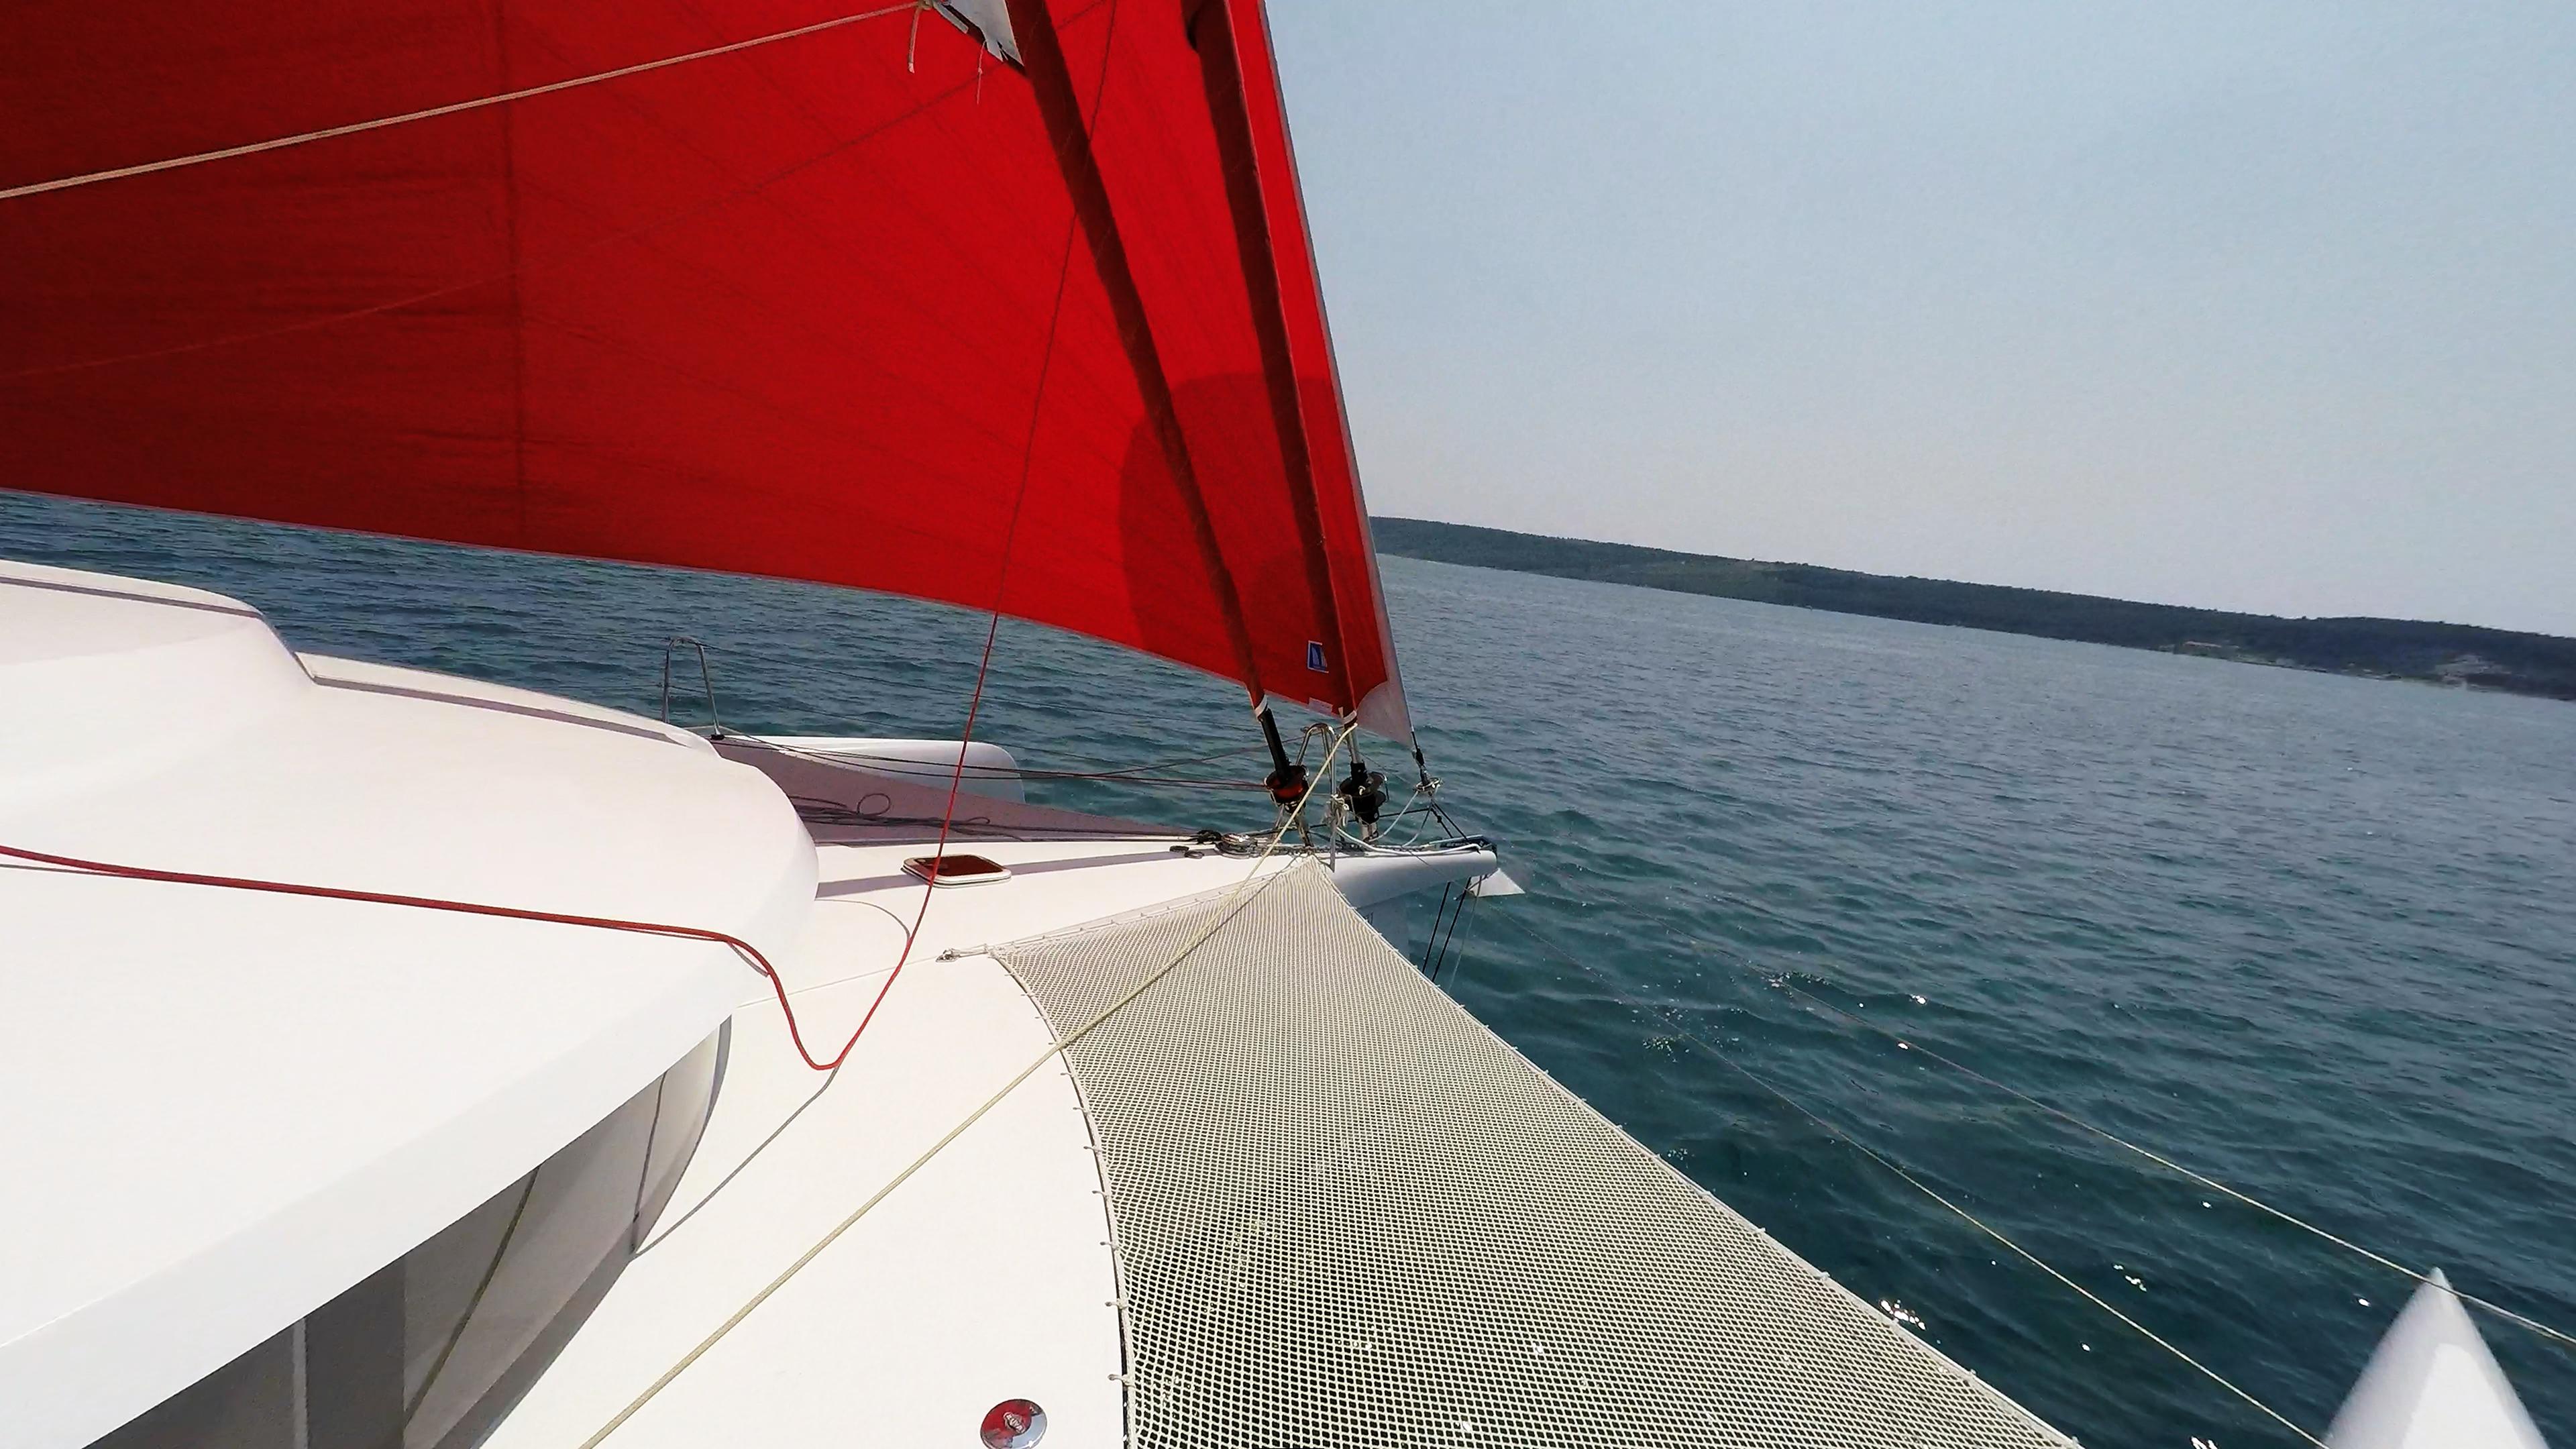 prua di multiscafo yacht trimarano gennaker vela